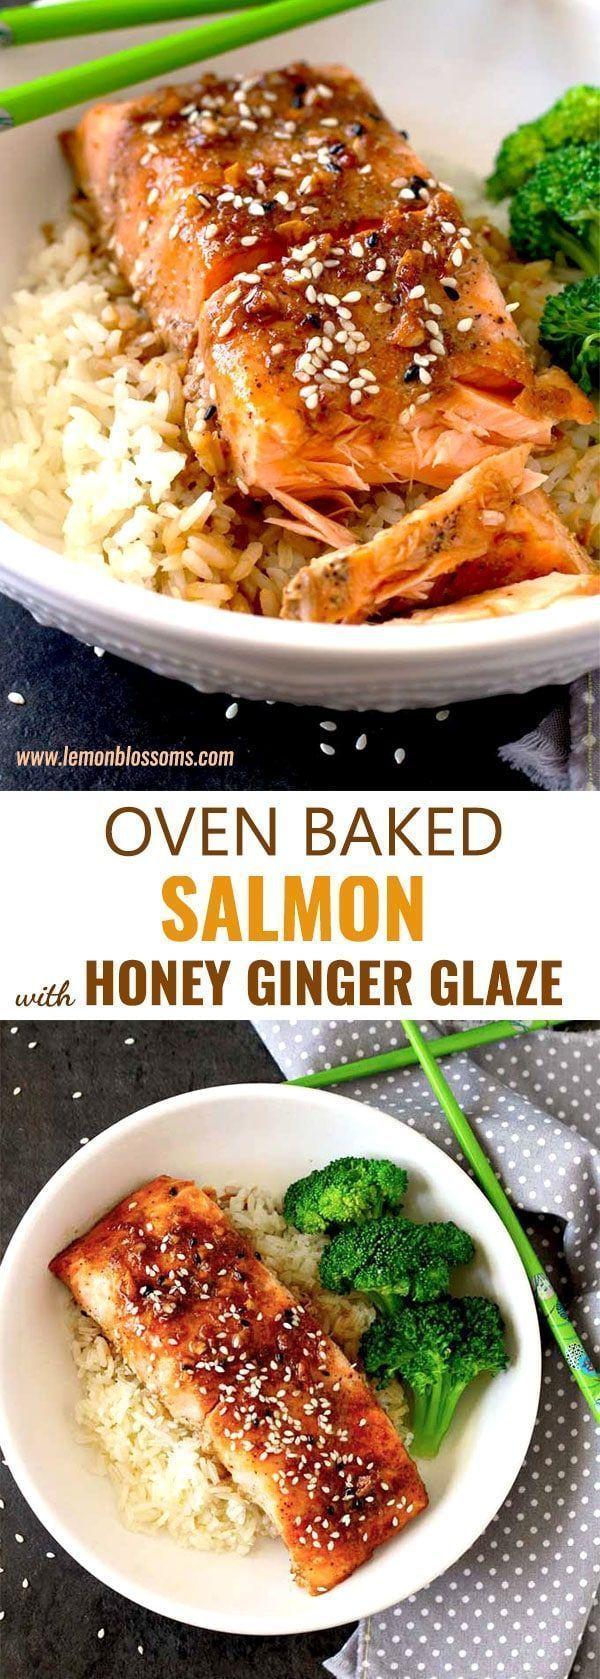 Oven Baked Salmon with Honey Ginger Glaze